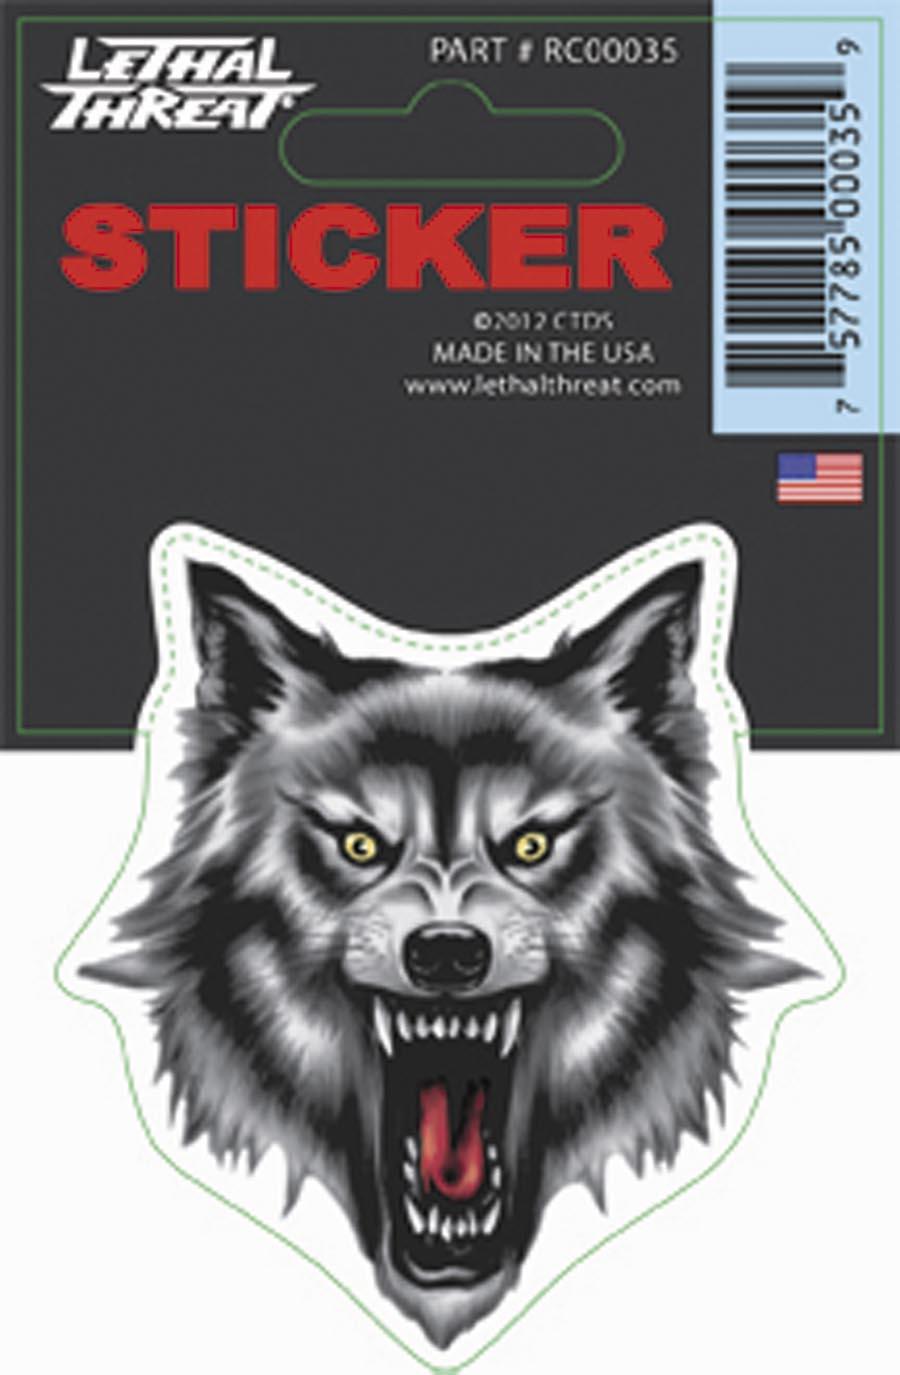 Lethal Threat Wolf Head Decal